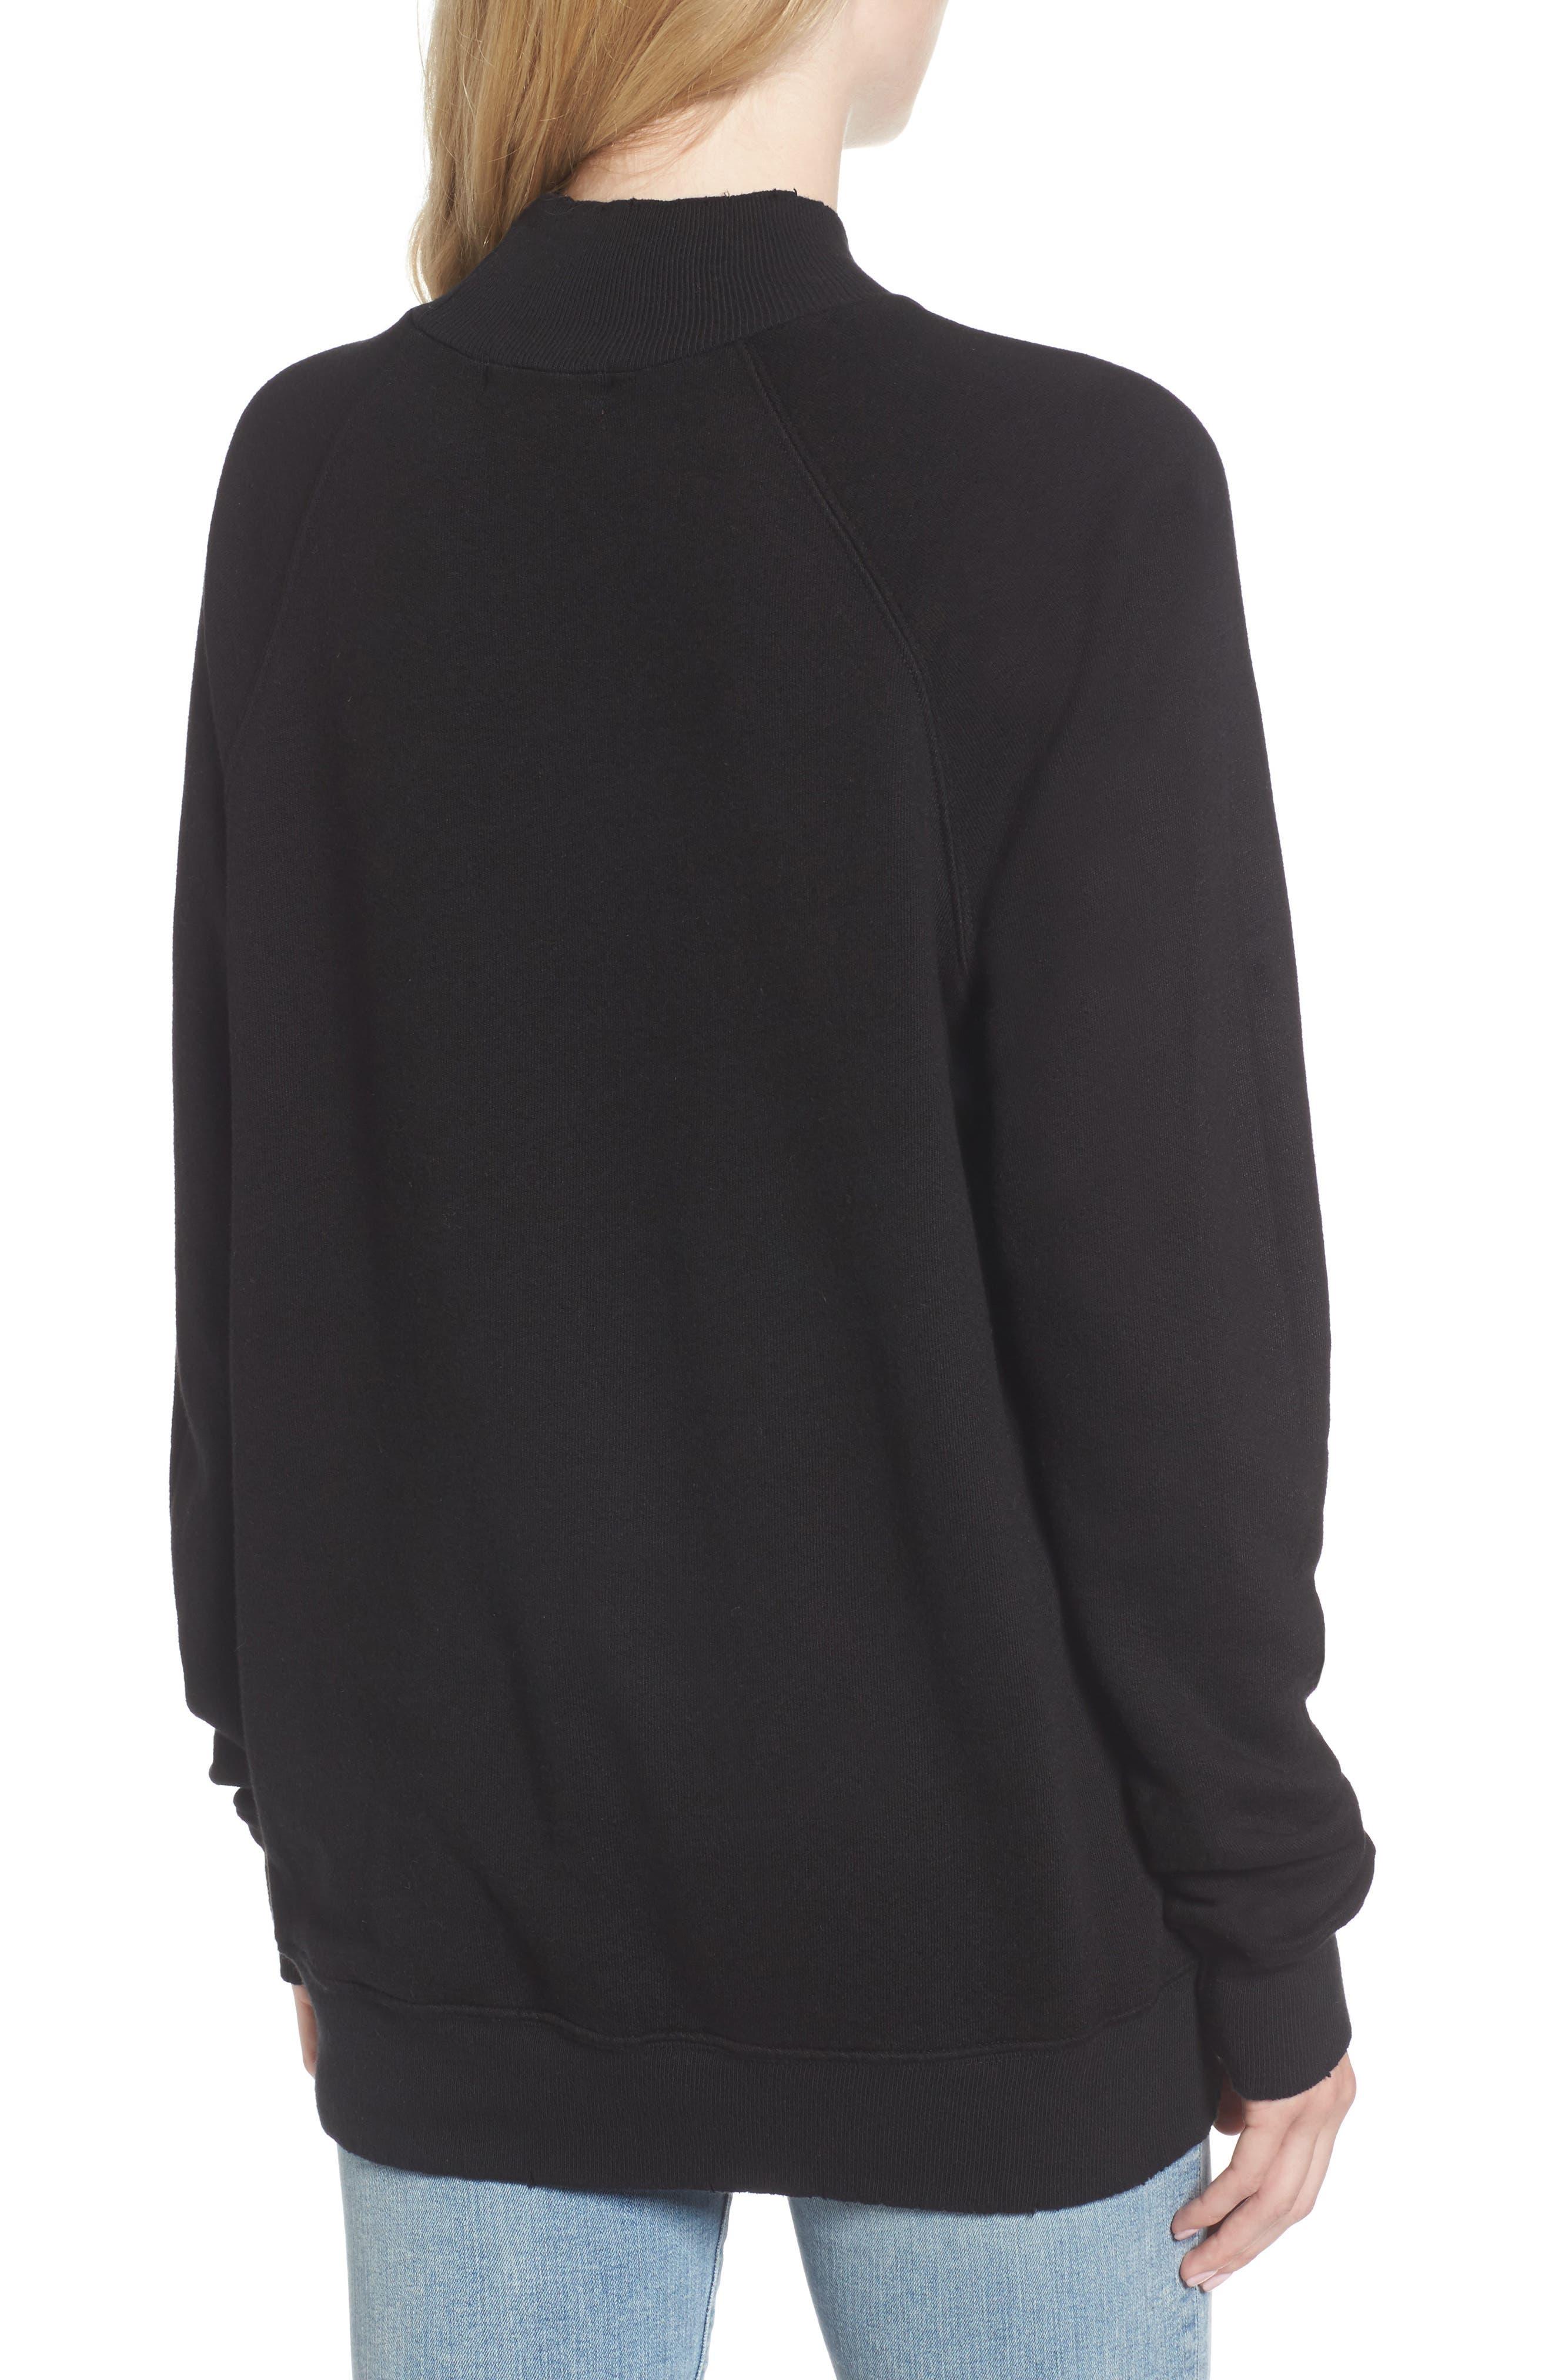 Zuma Mock Neck Sweatshirt,                             Alternate thumbnail 2, color,                             001